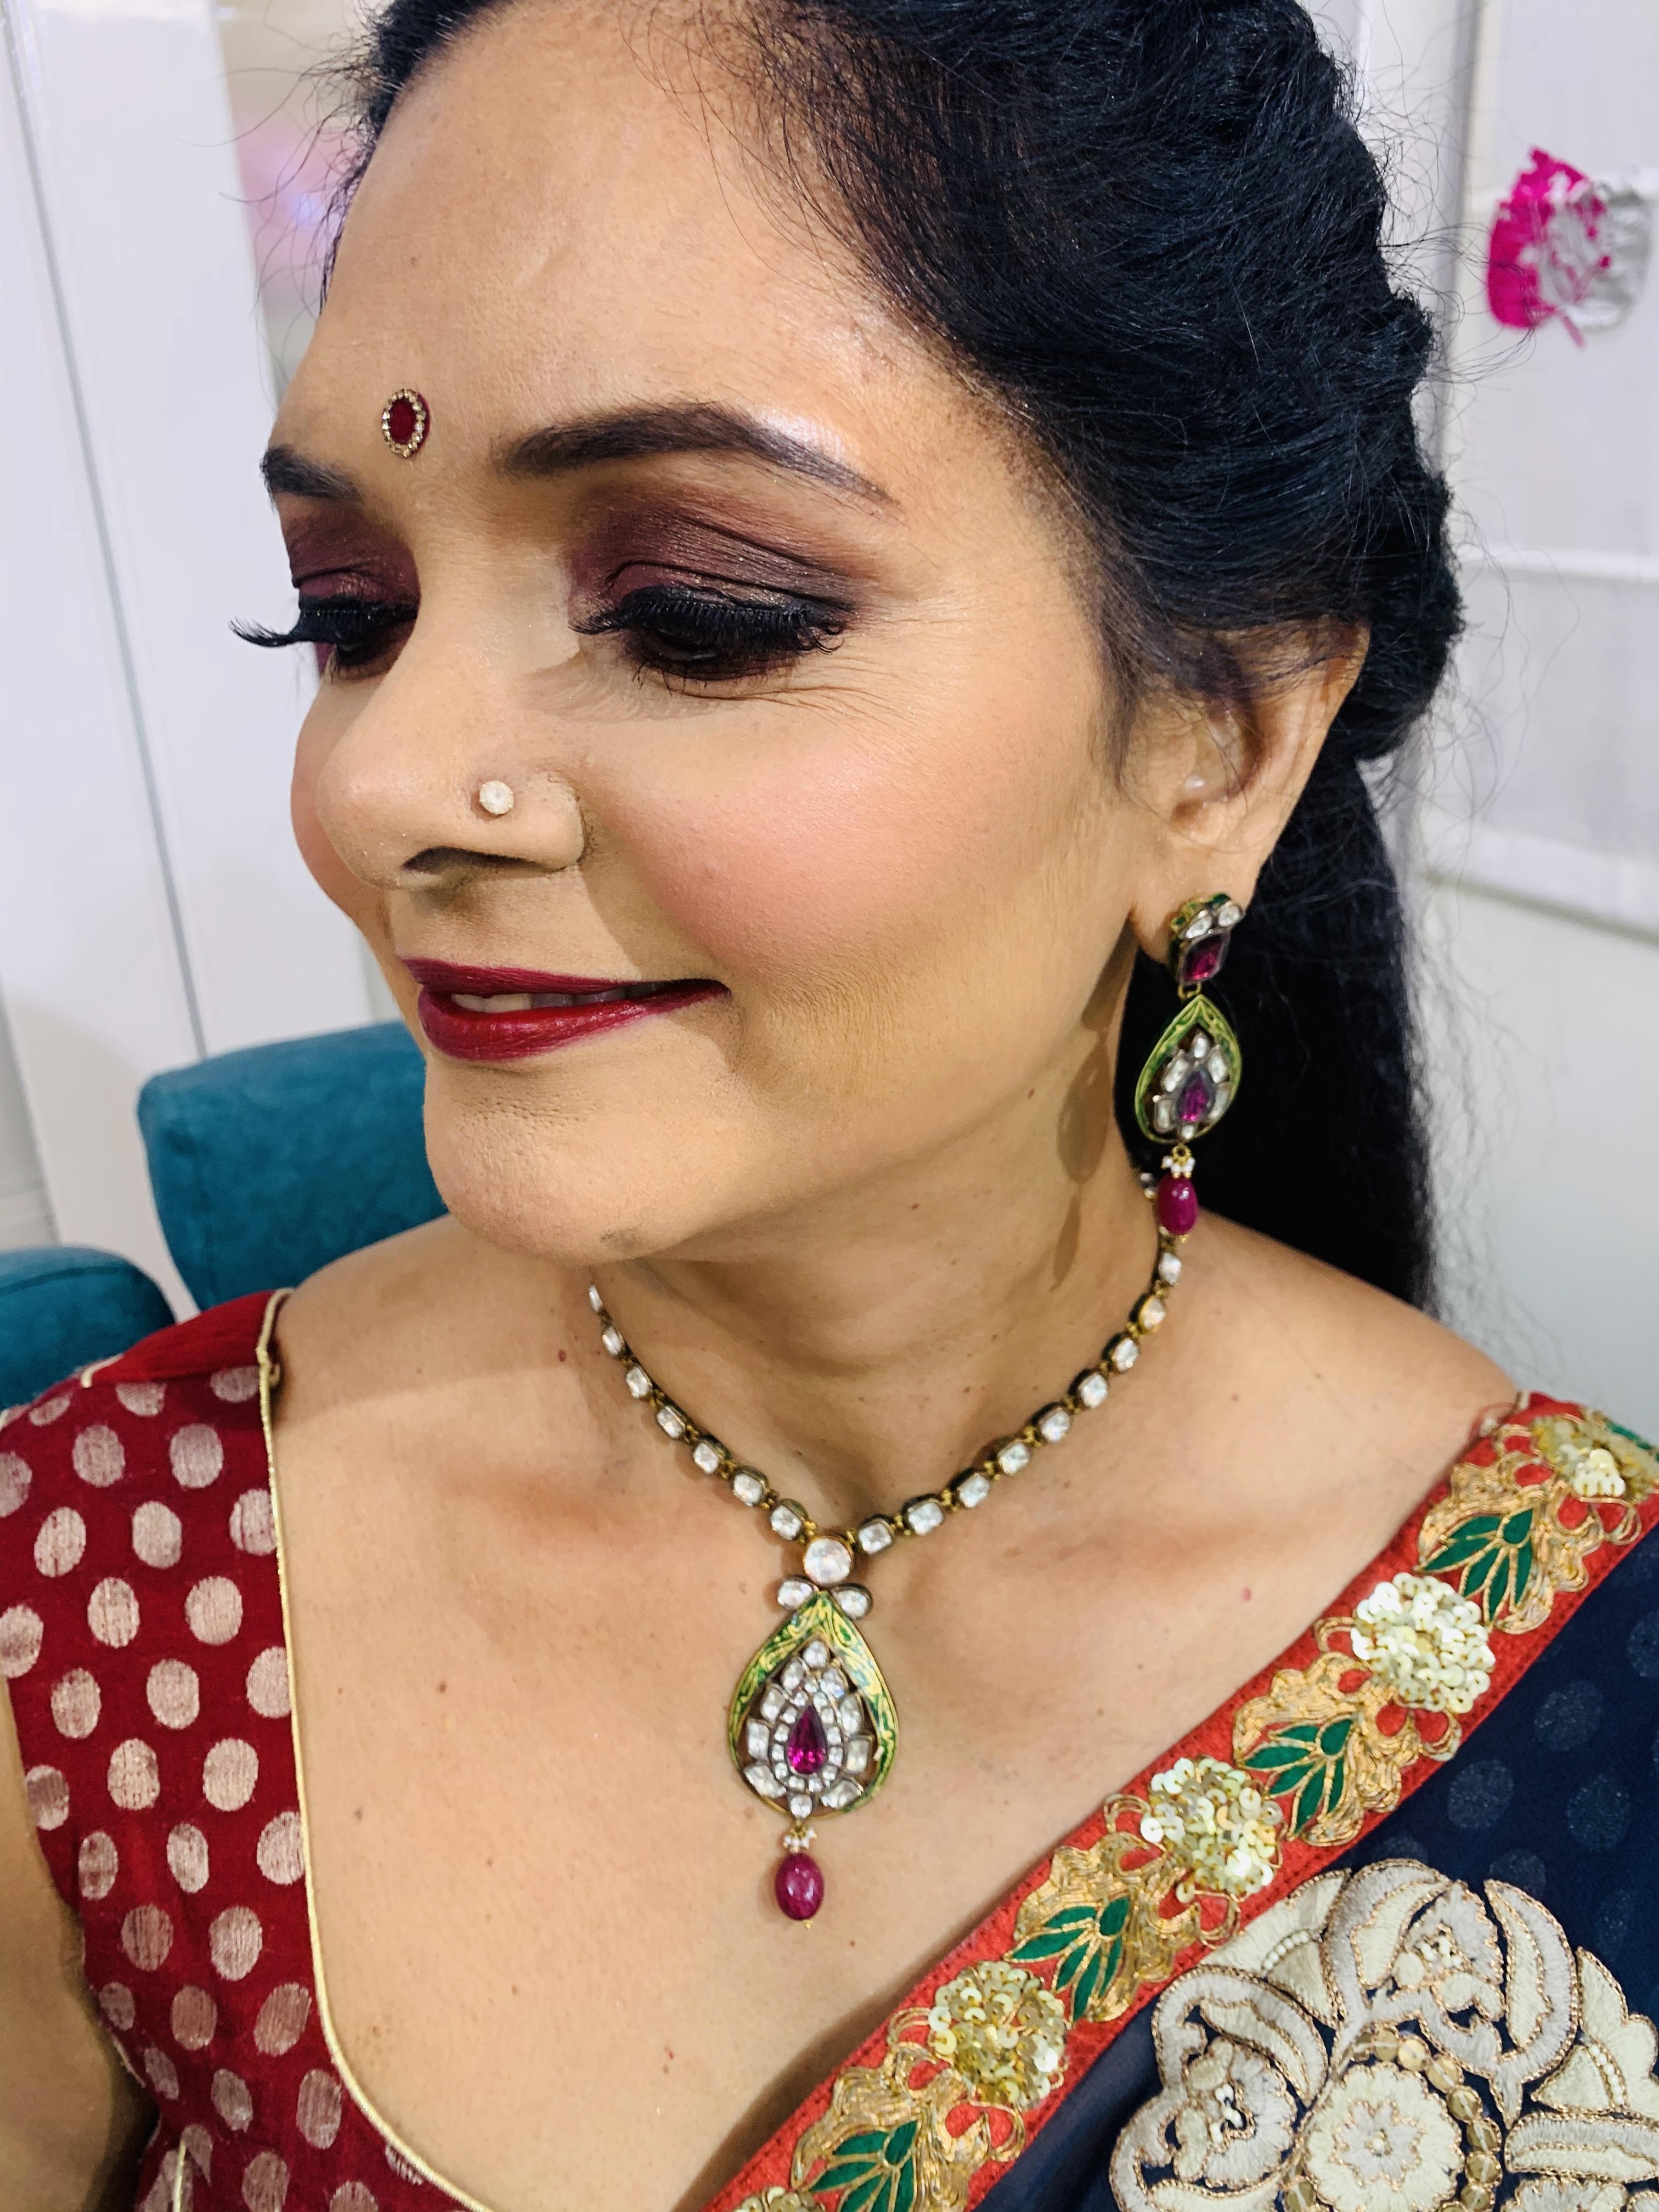 Neharika Malhotra Makeup Artist Services, Review and Info ...